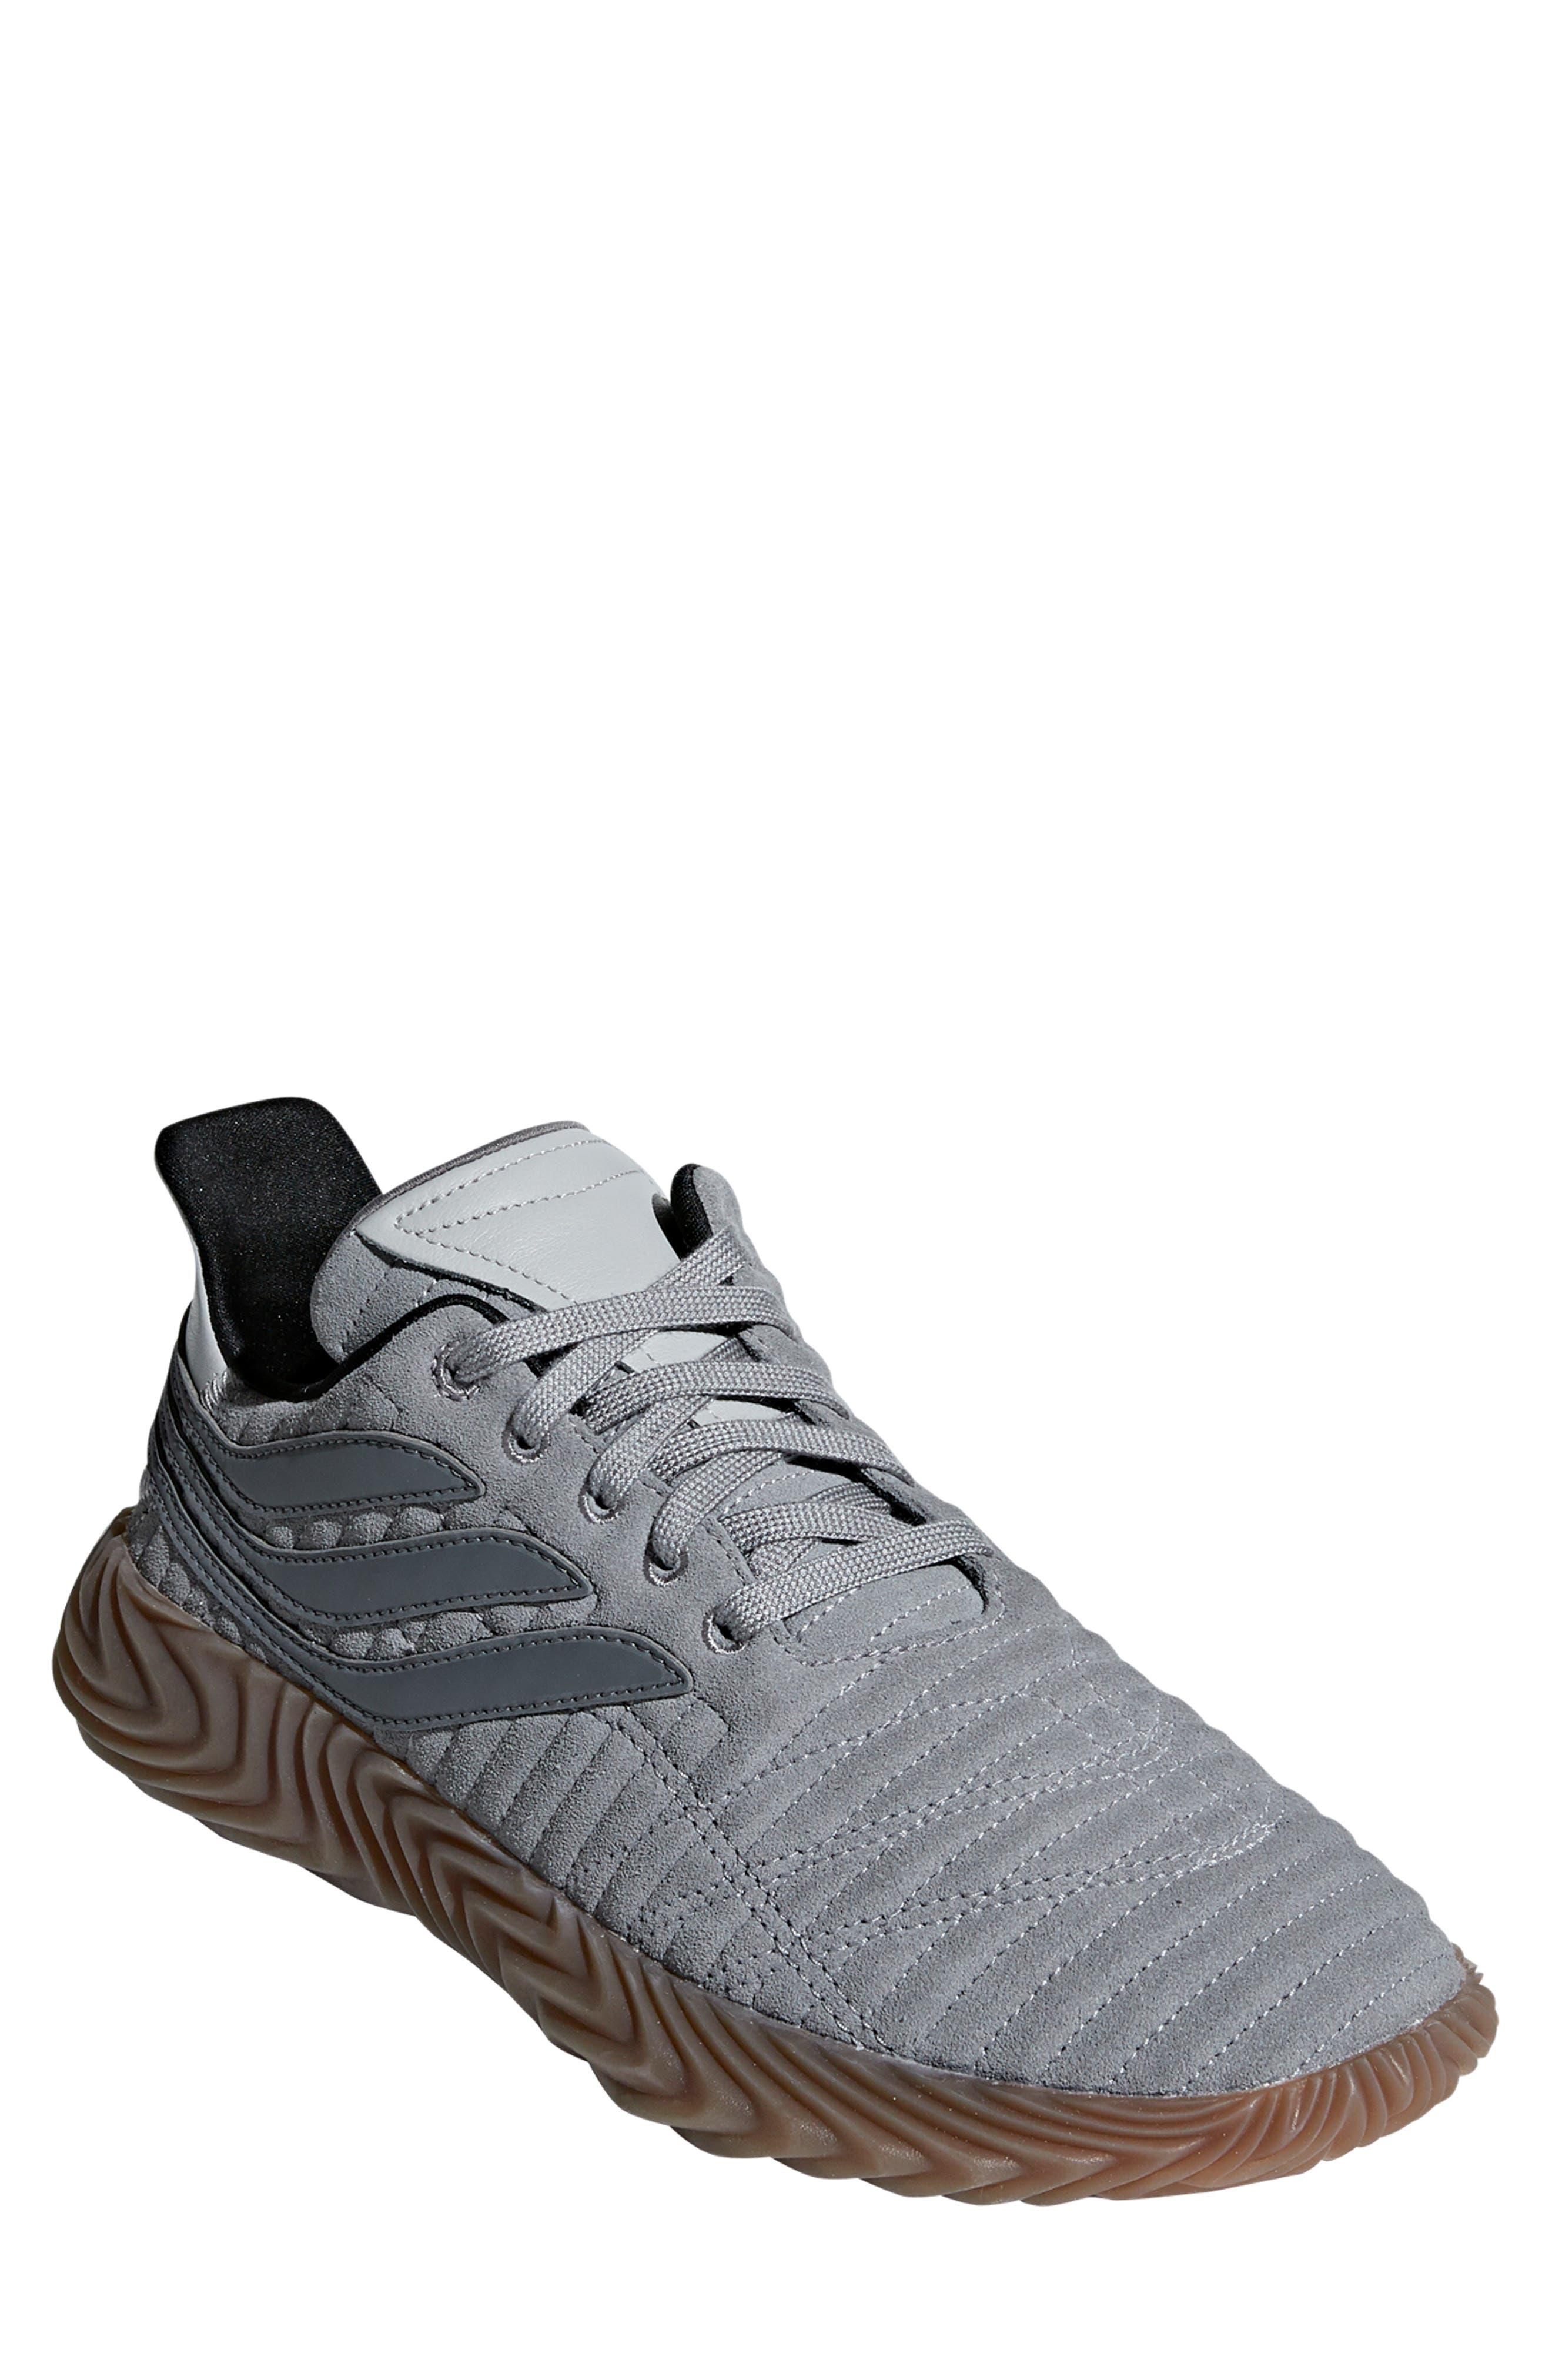 Sobakov Sneaker,                             Main thumbnail 1, color,                             GREY/ GREY